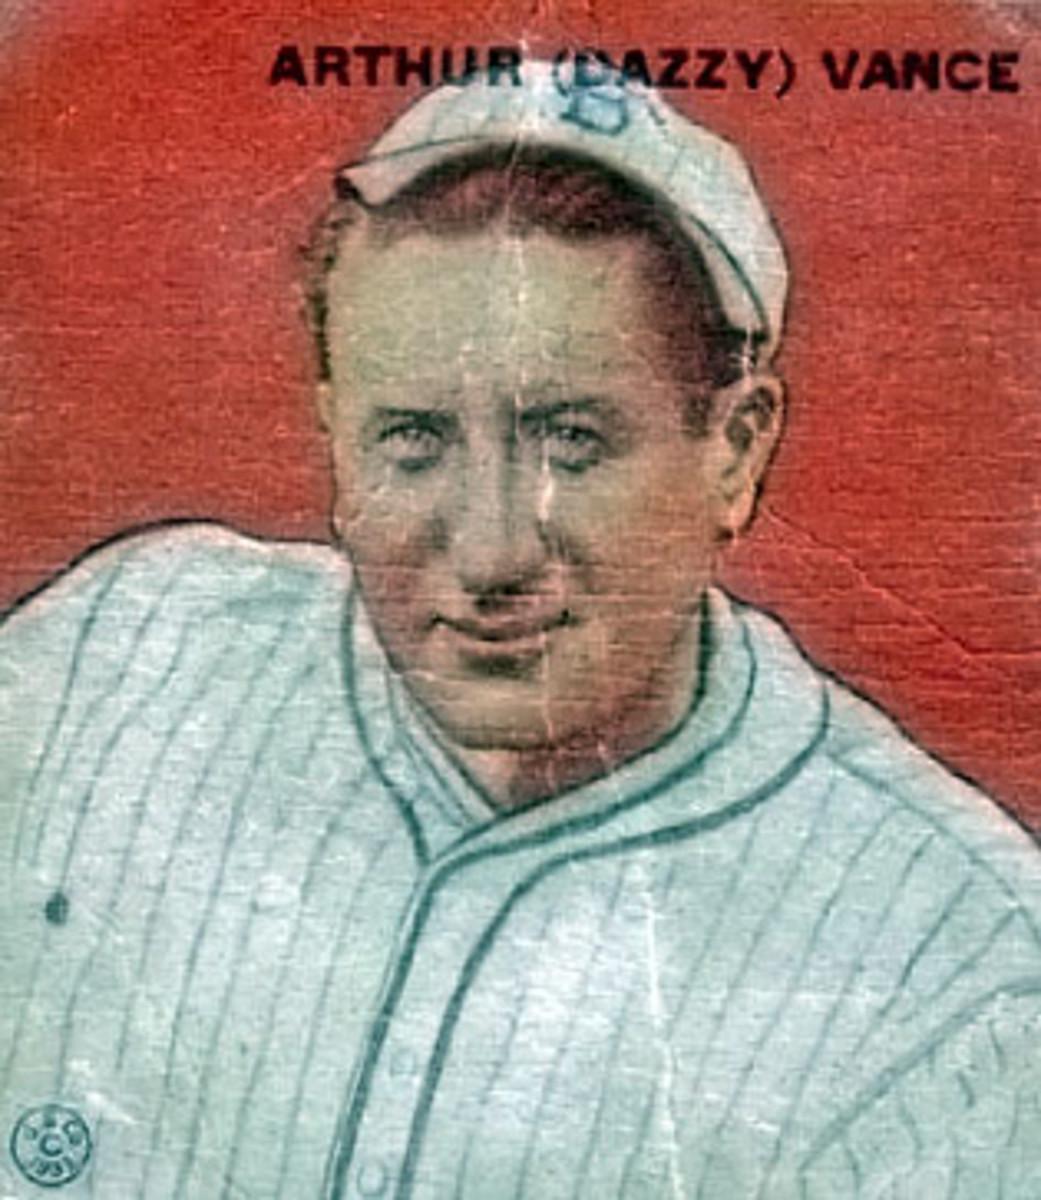 1933 Goudey Baseball Card of Dazzy Vance.